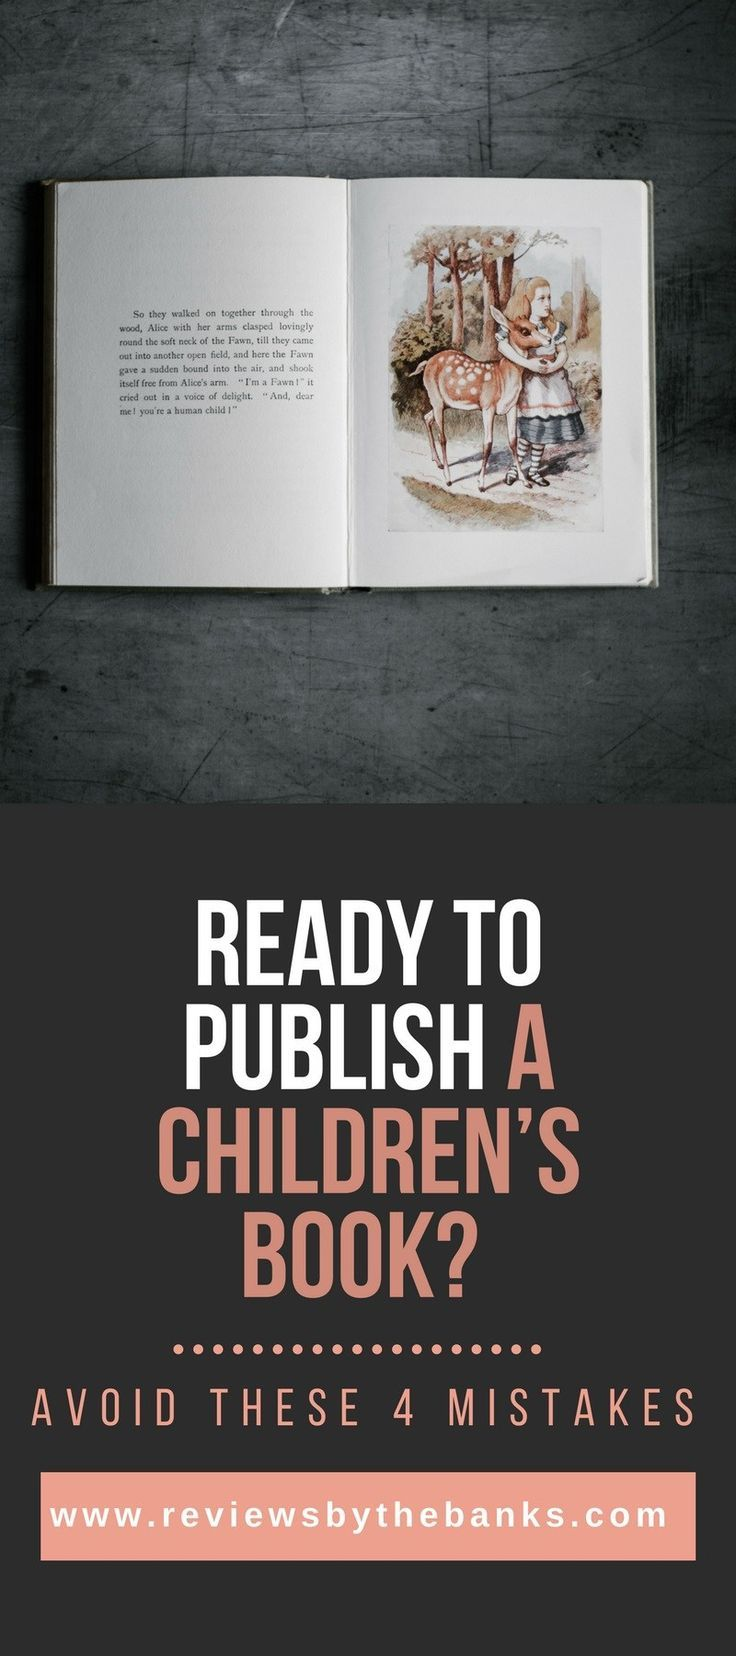 Mistakes to Avoid when Publishing Children's Books